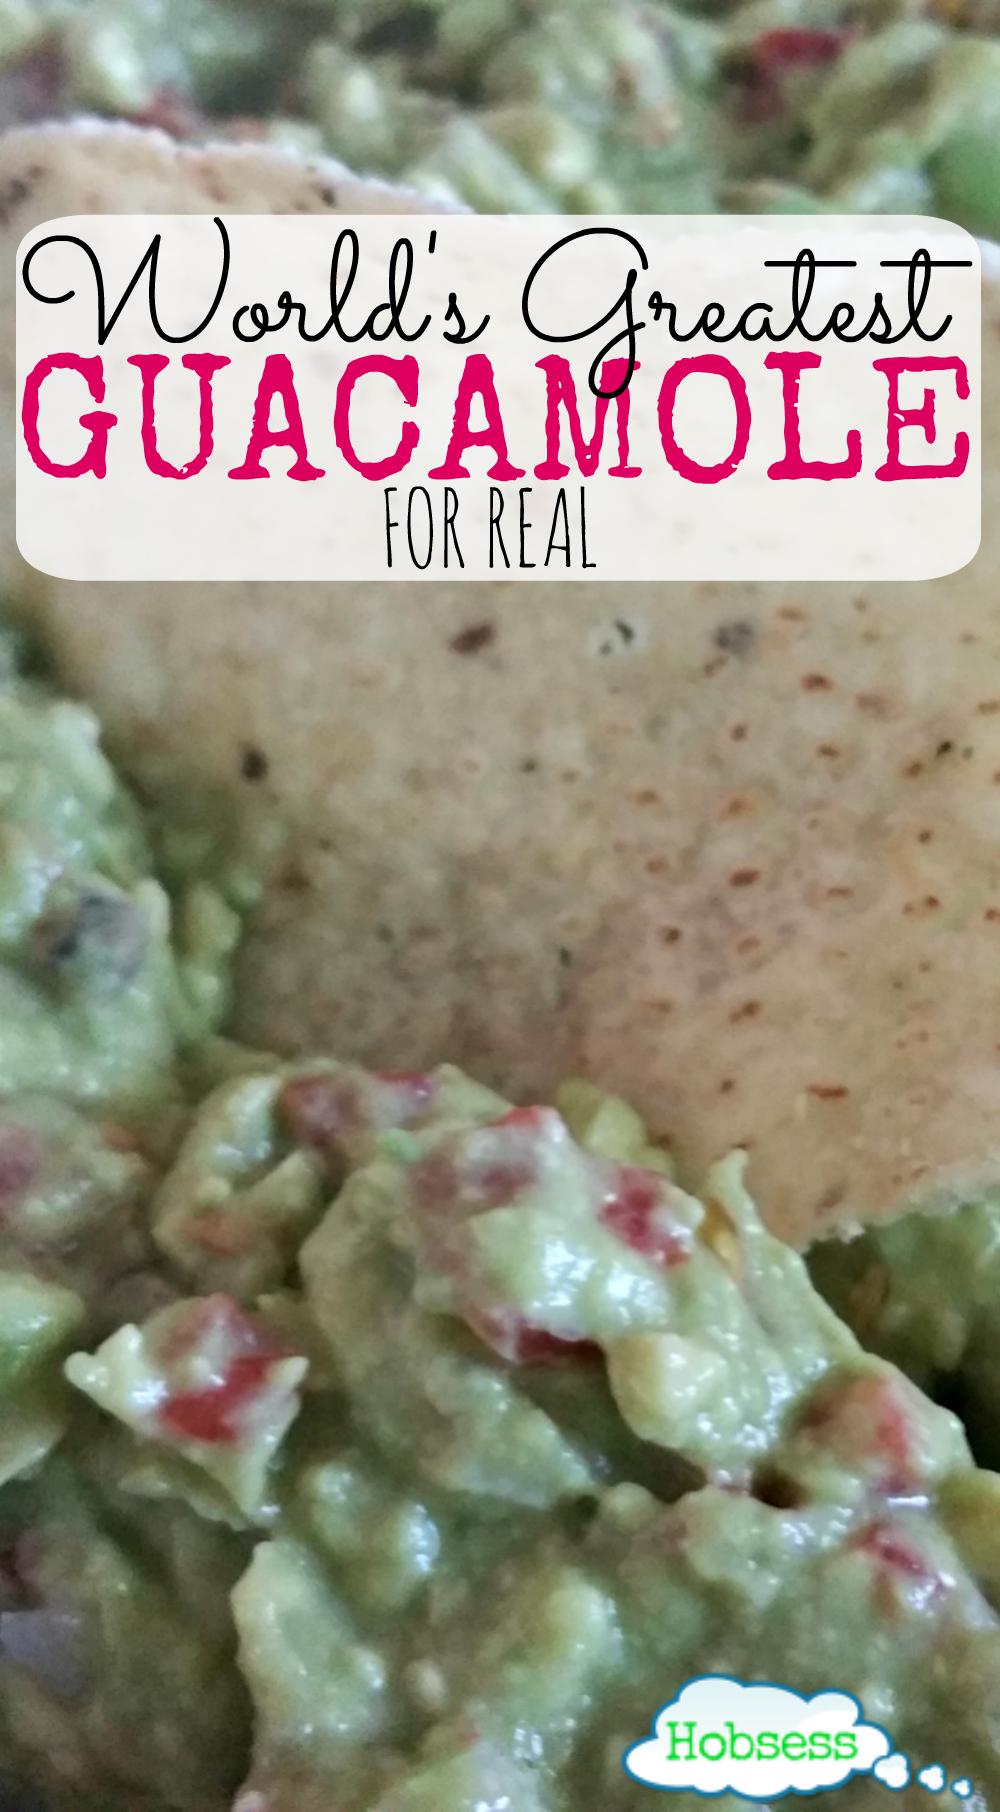 Secrets of Making the World's Greatest Guacamole